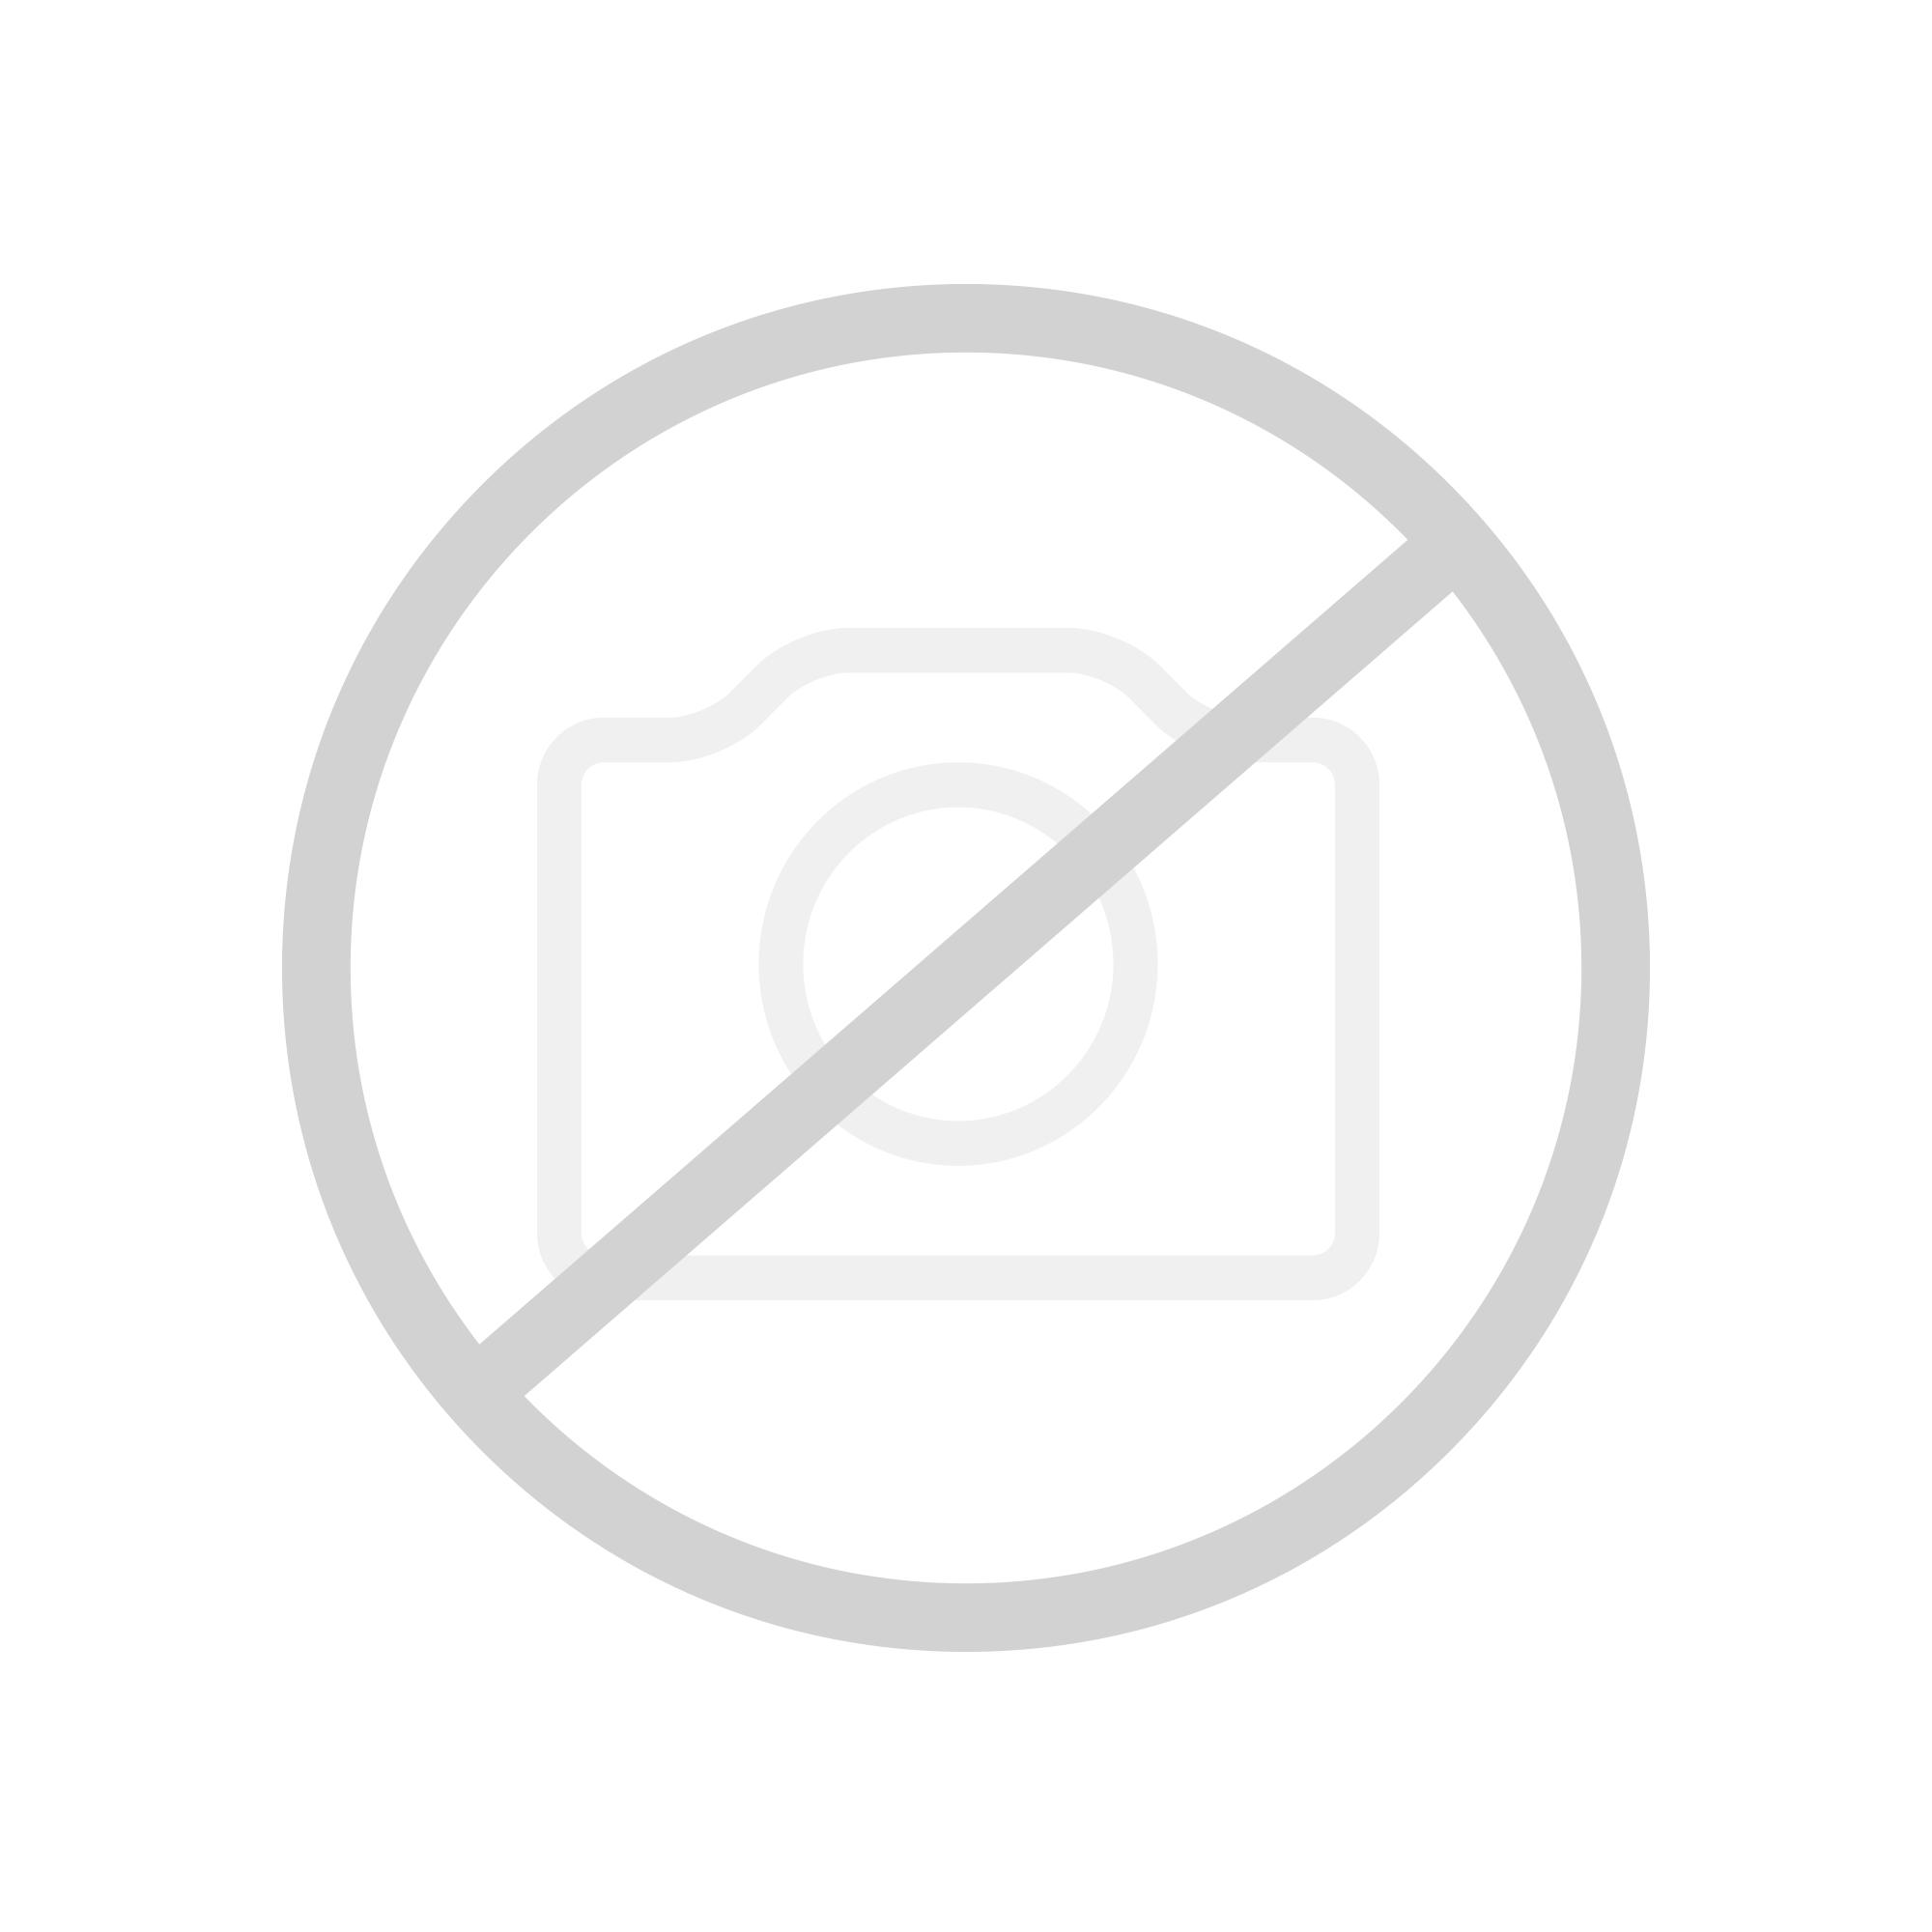 antoniolupi TAPE54 Handtuchablage 540 x 80 x 50 mm